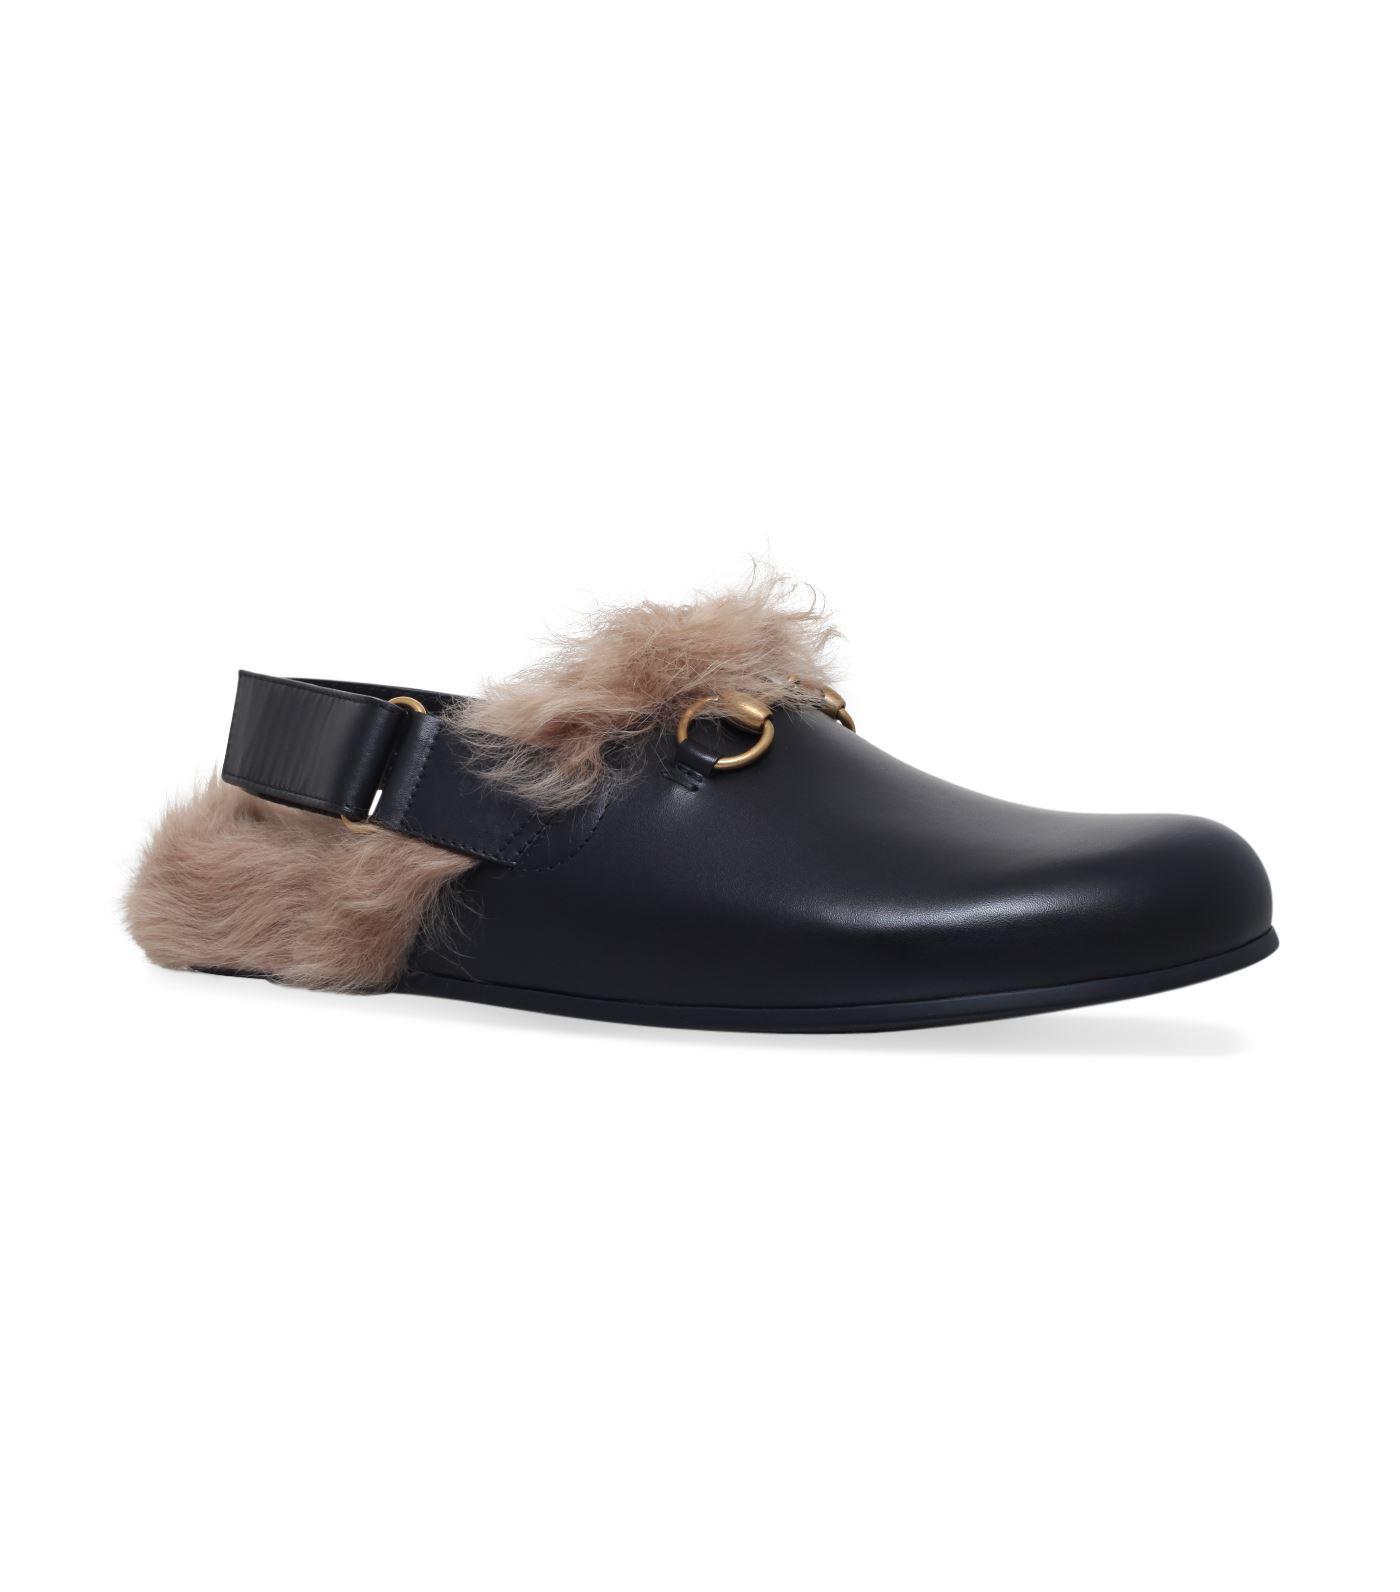 c814b2ba0 Gucci River Fur Slides in Black - Lyst